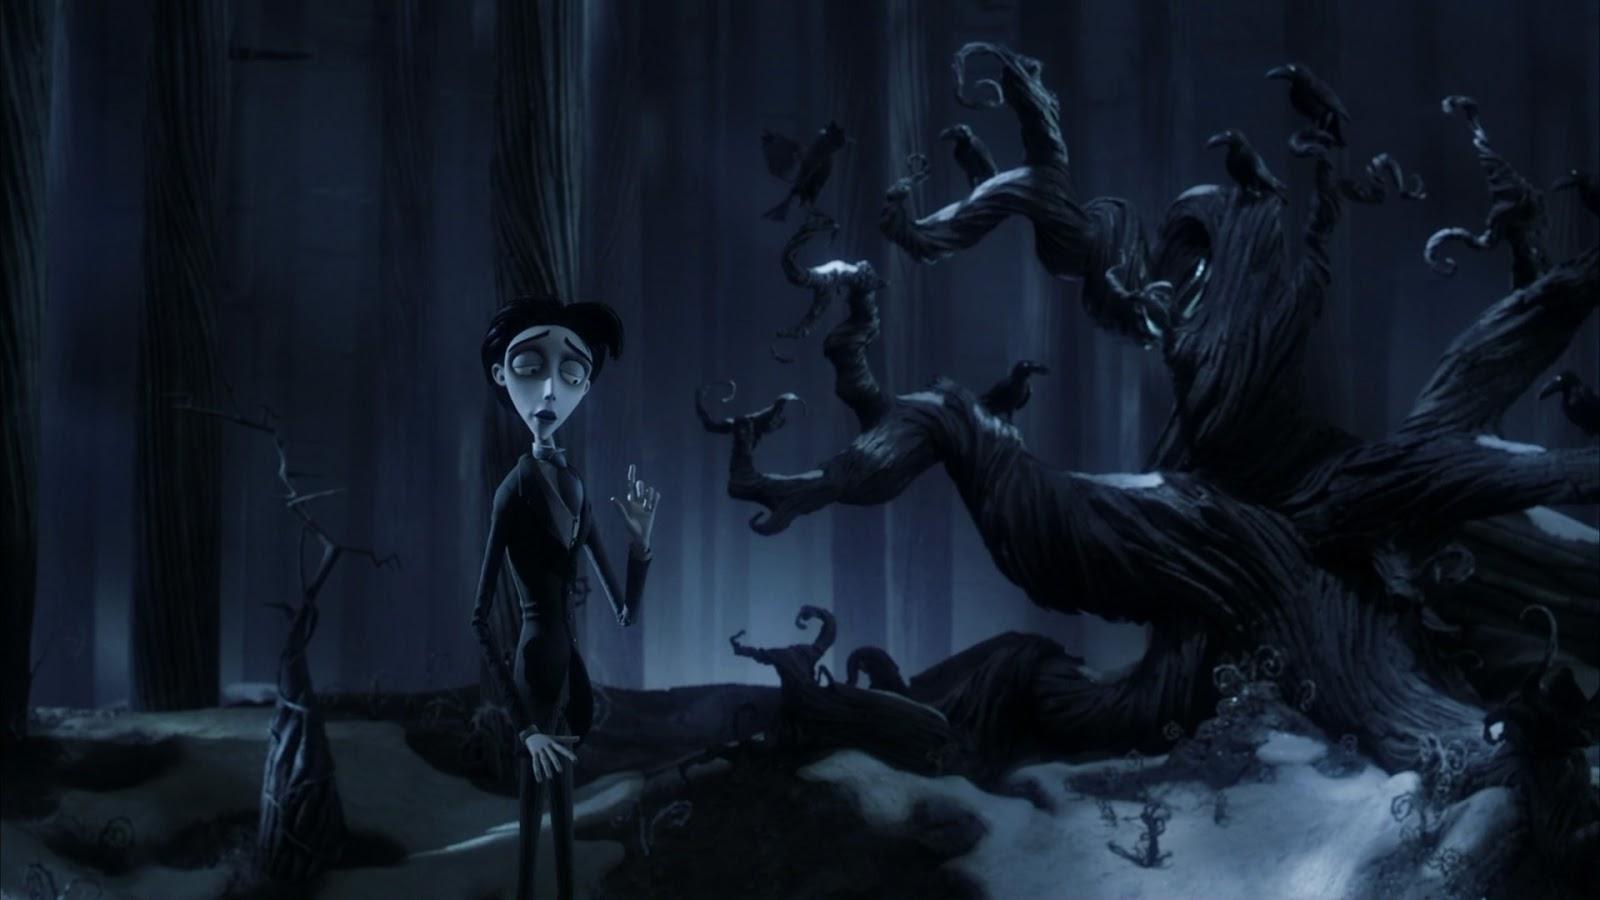 corpse bride tim burton johnny depp stop motion animation